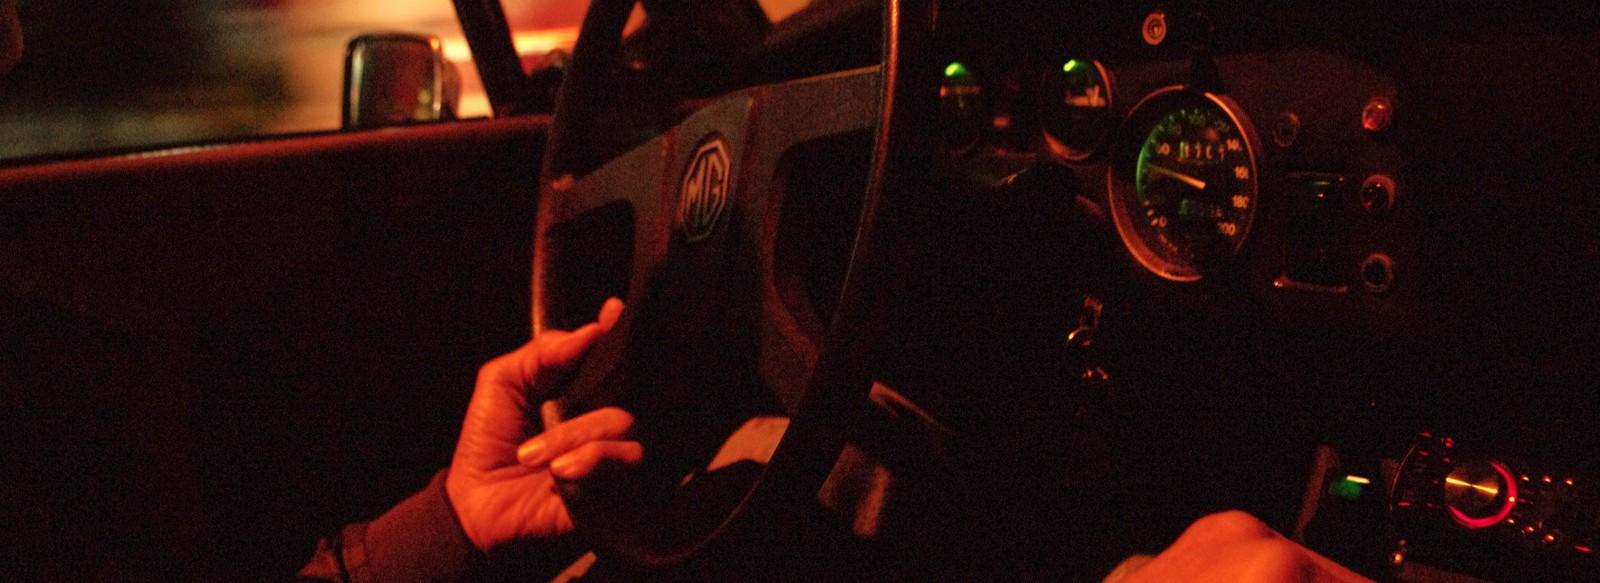 GPSで社員や社用車を効率よく管理する